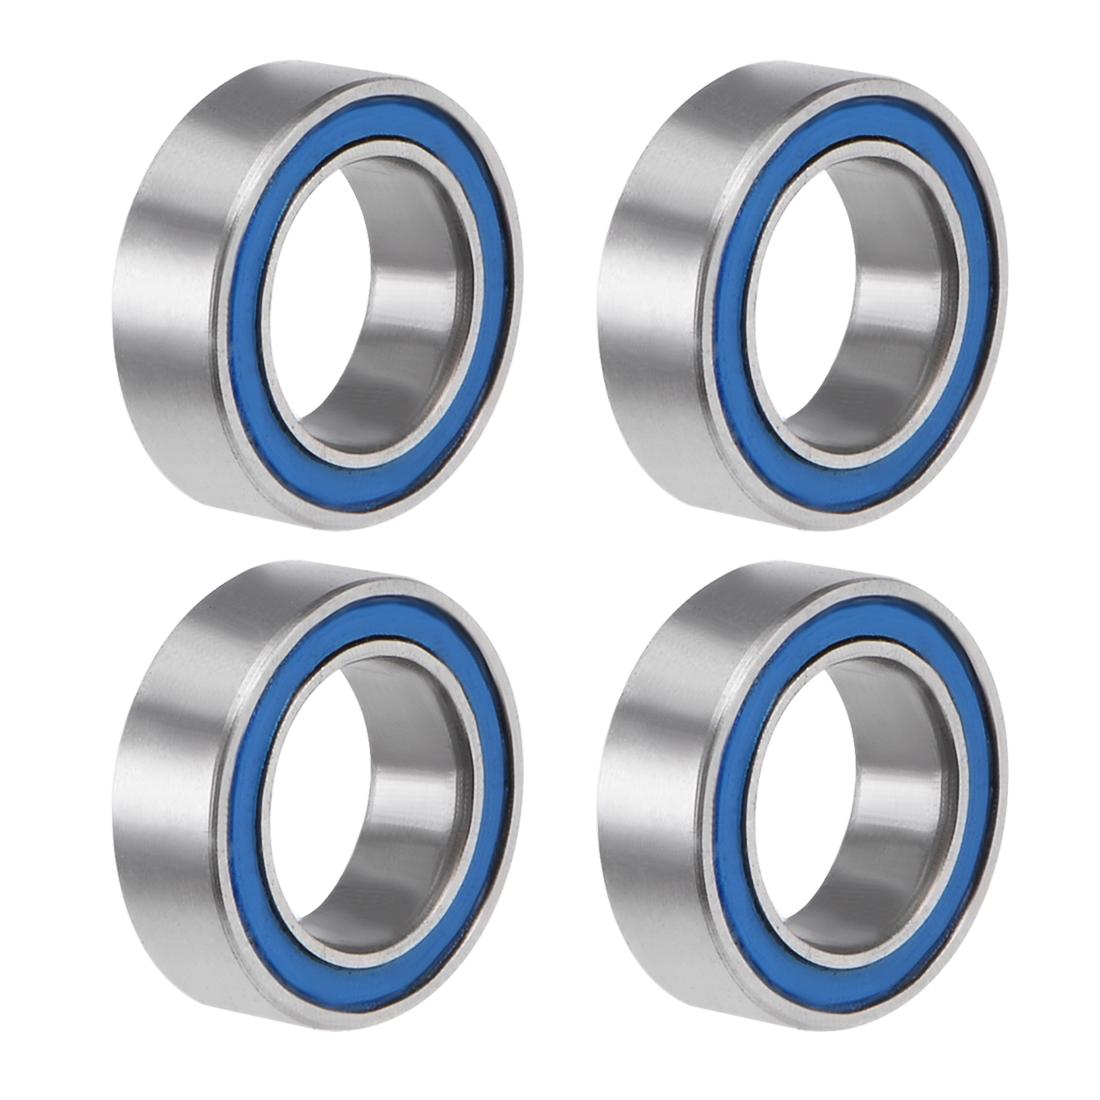 MR85-2RS Ball Bearing 5x8x2.5mm Double Sealed ABEC-3 Bearings 4pcs